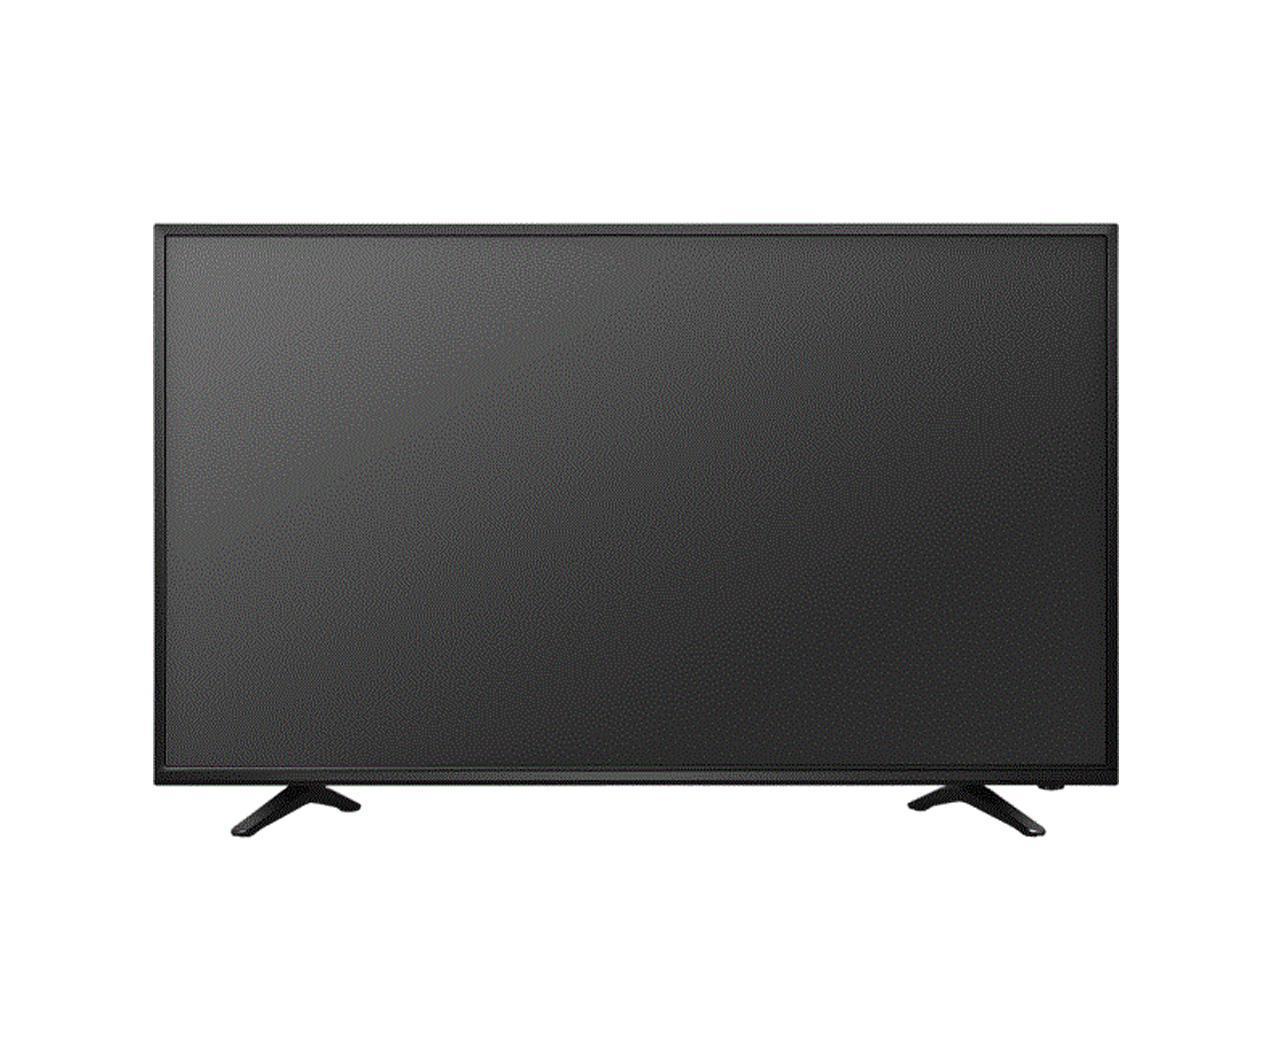 تلویزیون ال ای دی شهاب مدل 49SH216N سایز 49 اینچ